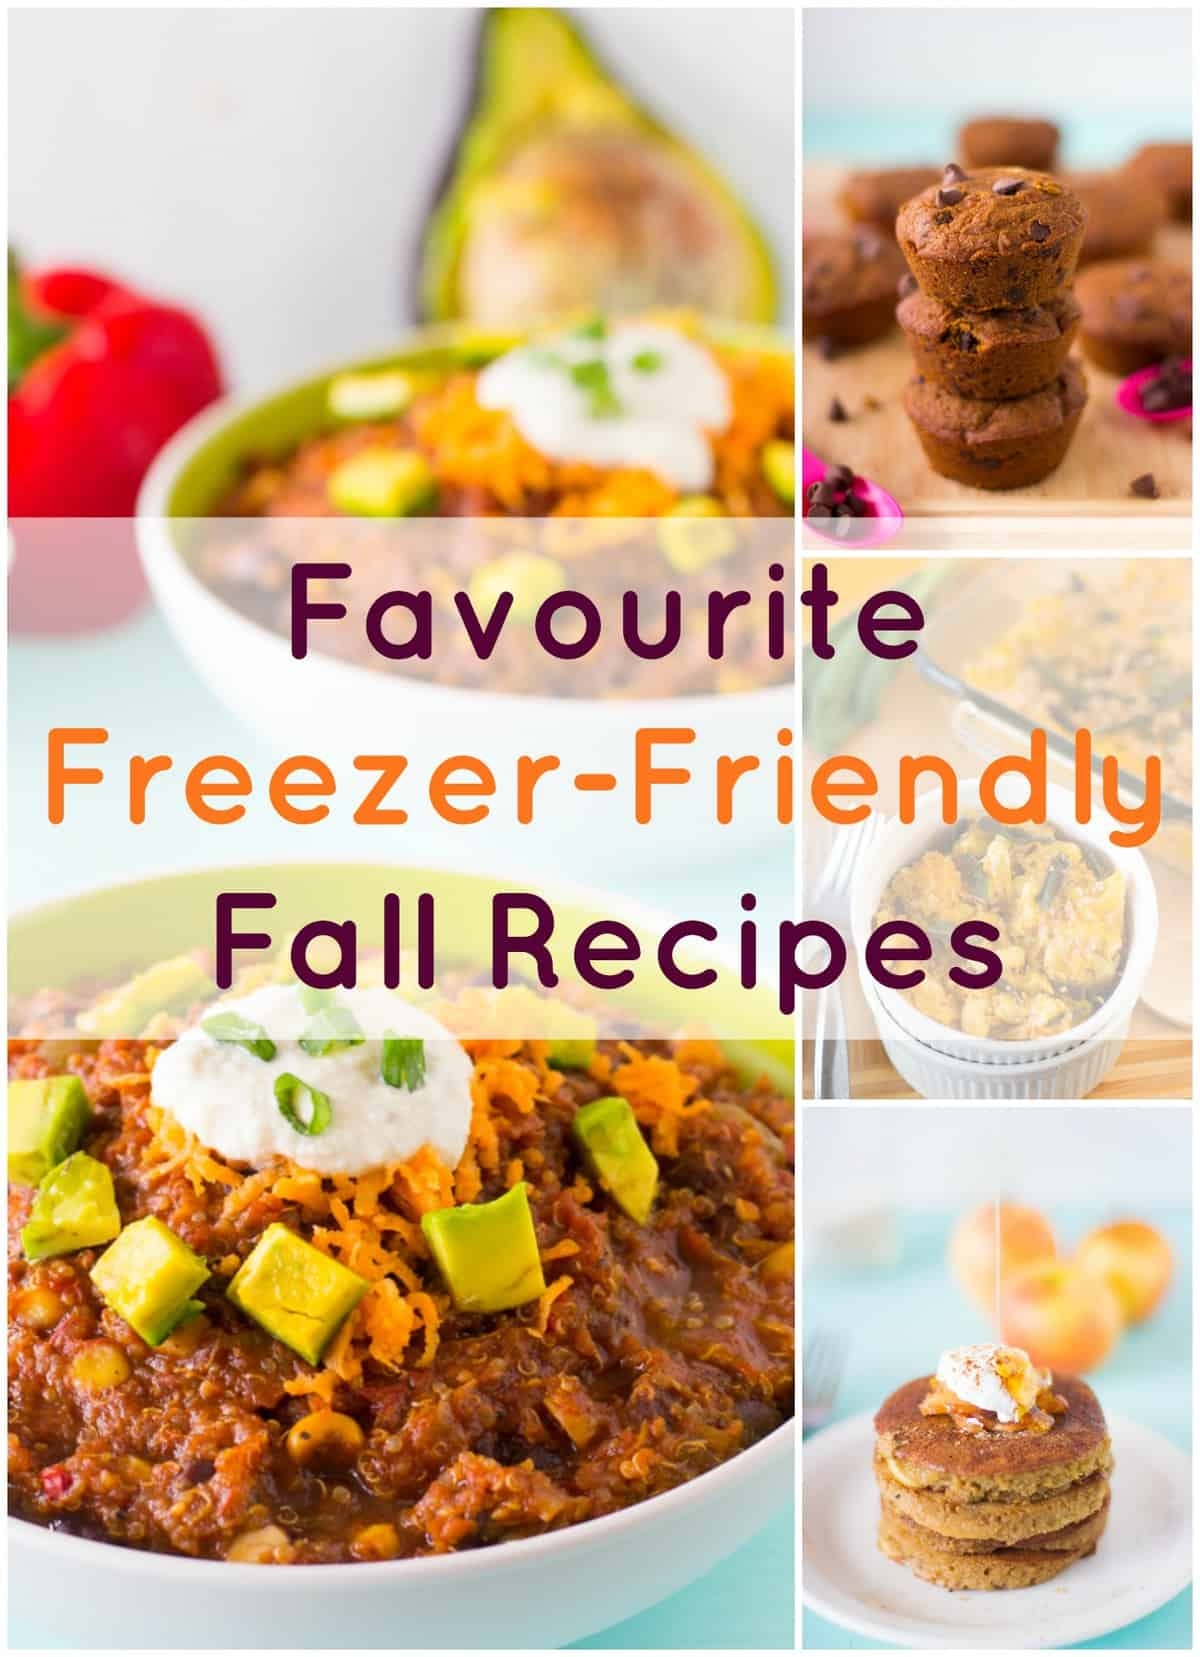 Favourite Freezer-Friendly Fall Recipes